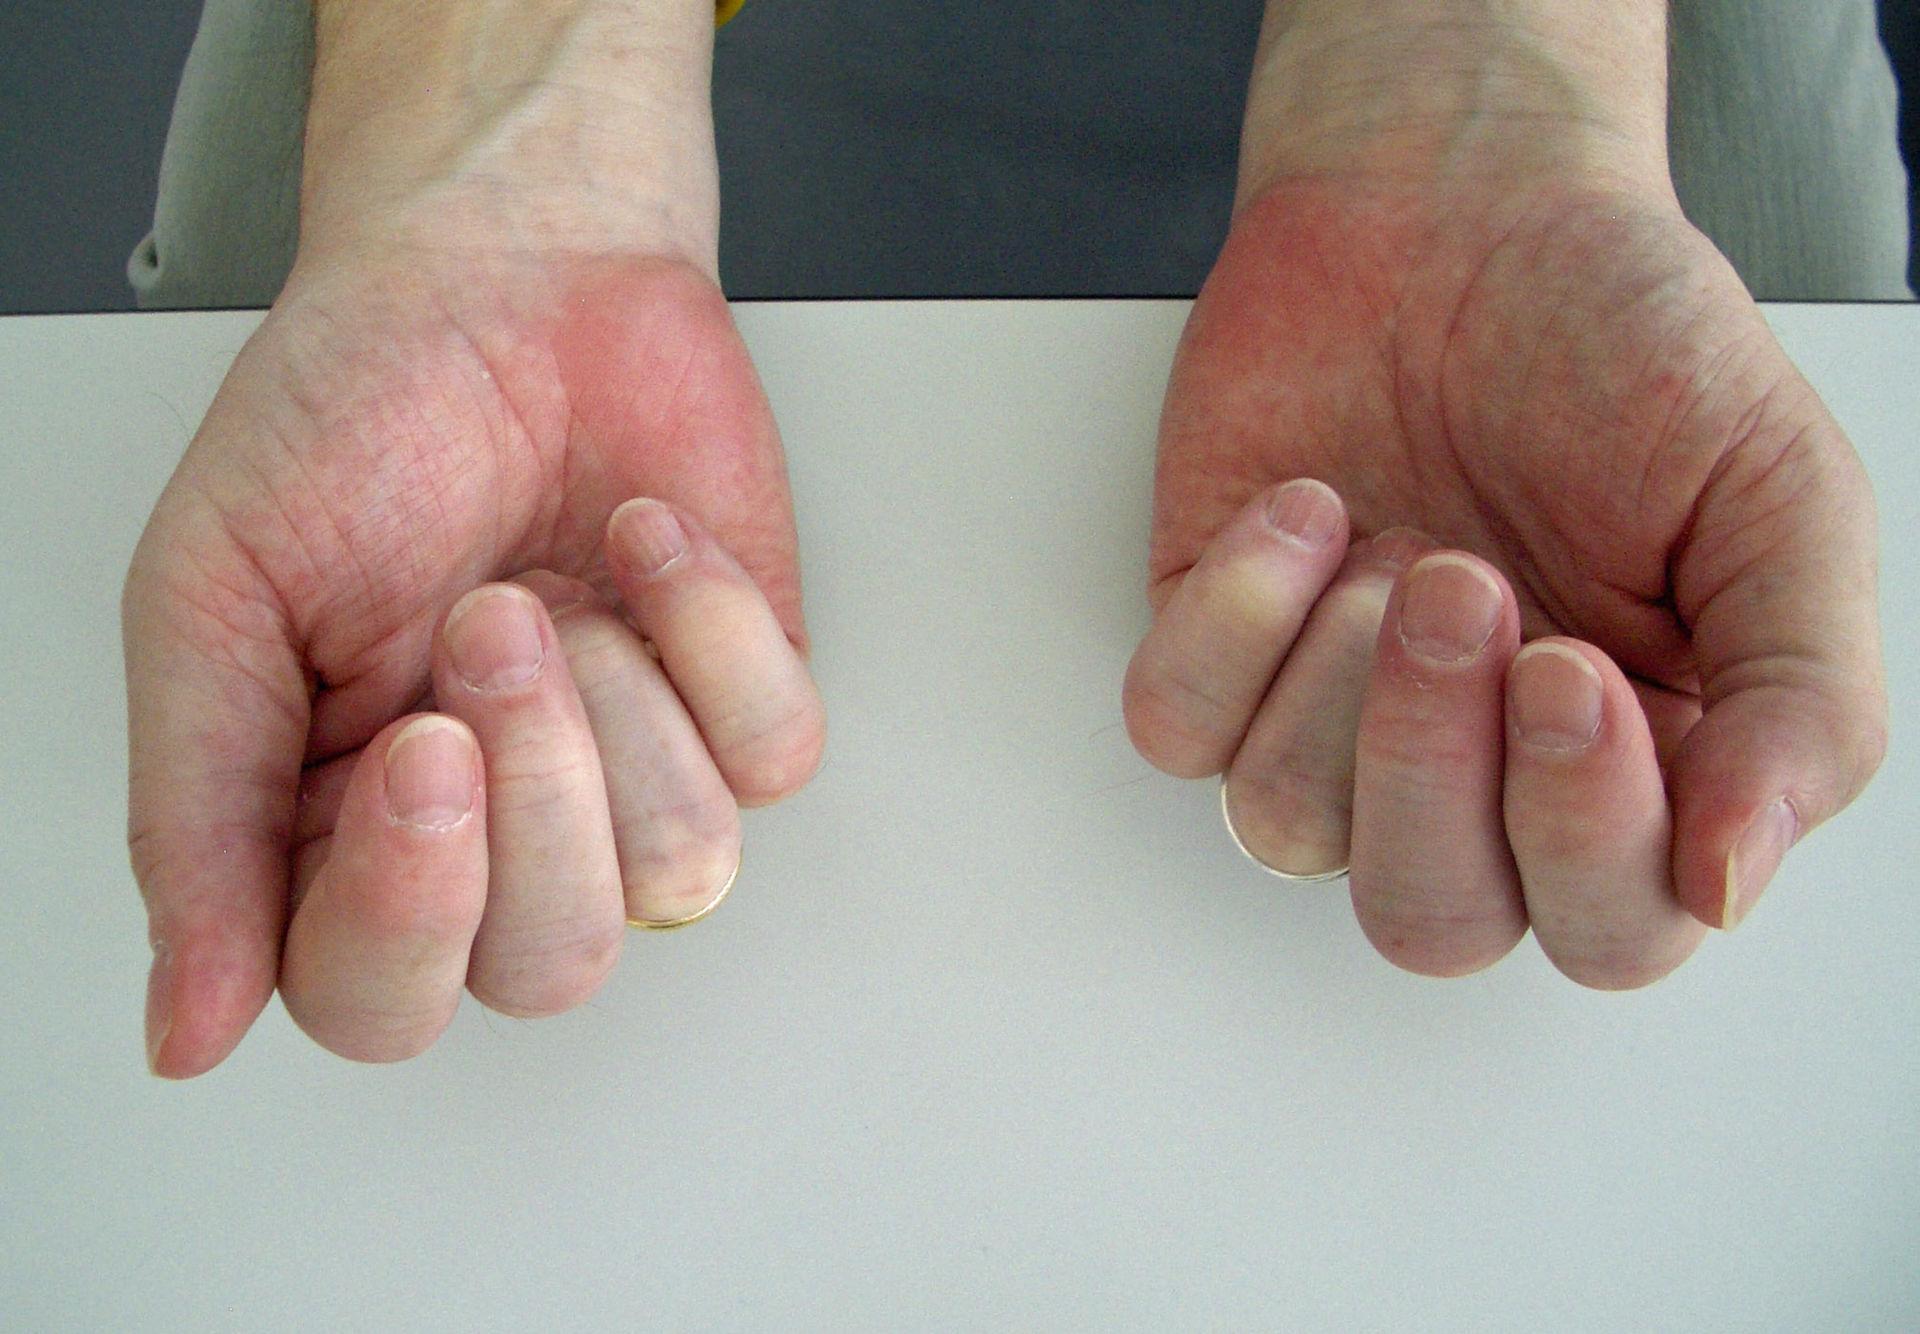 Fist in a patient with rheumatoid arthritis